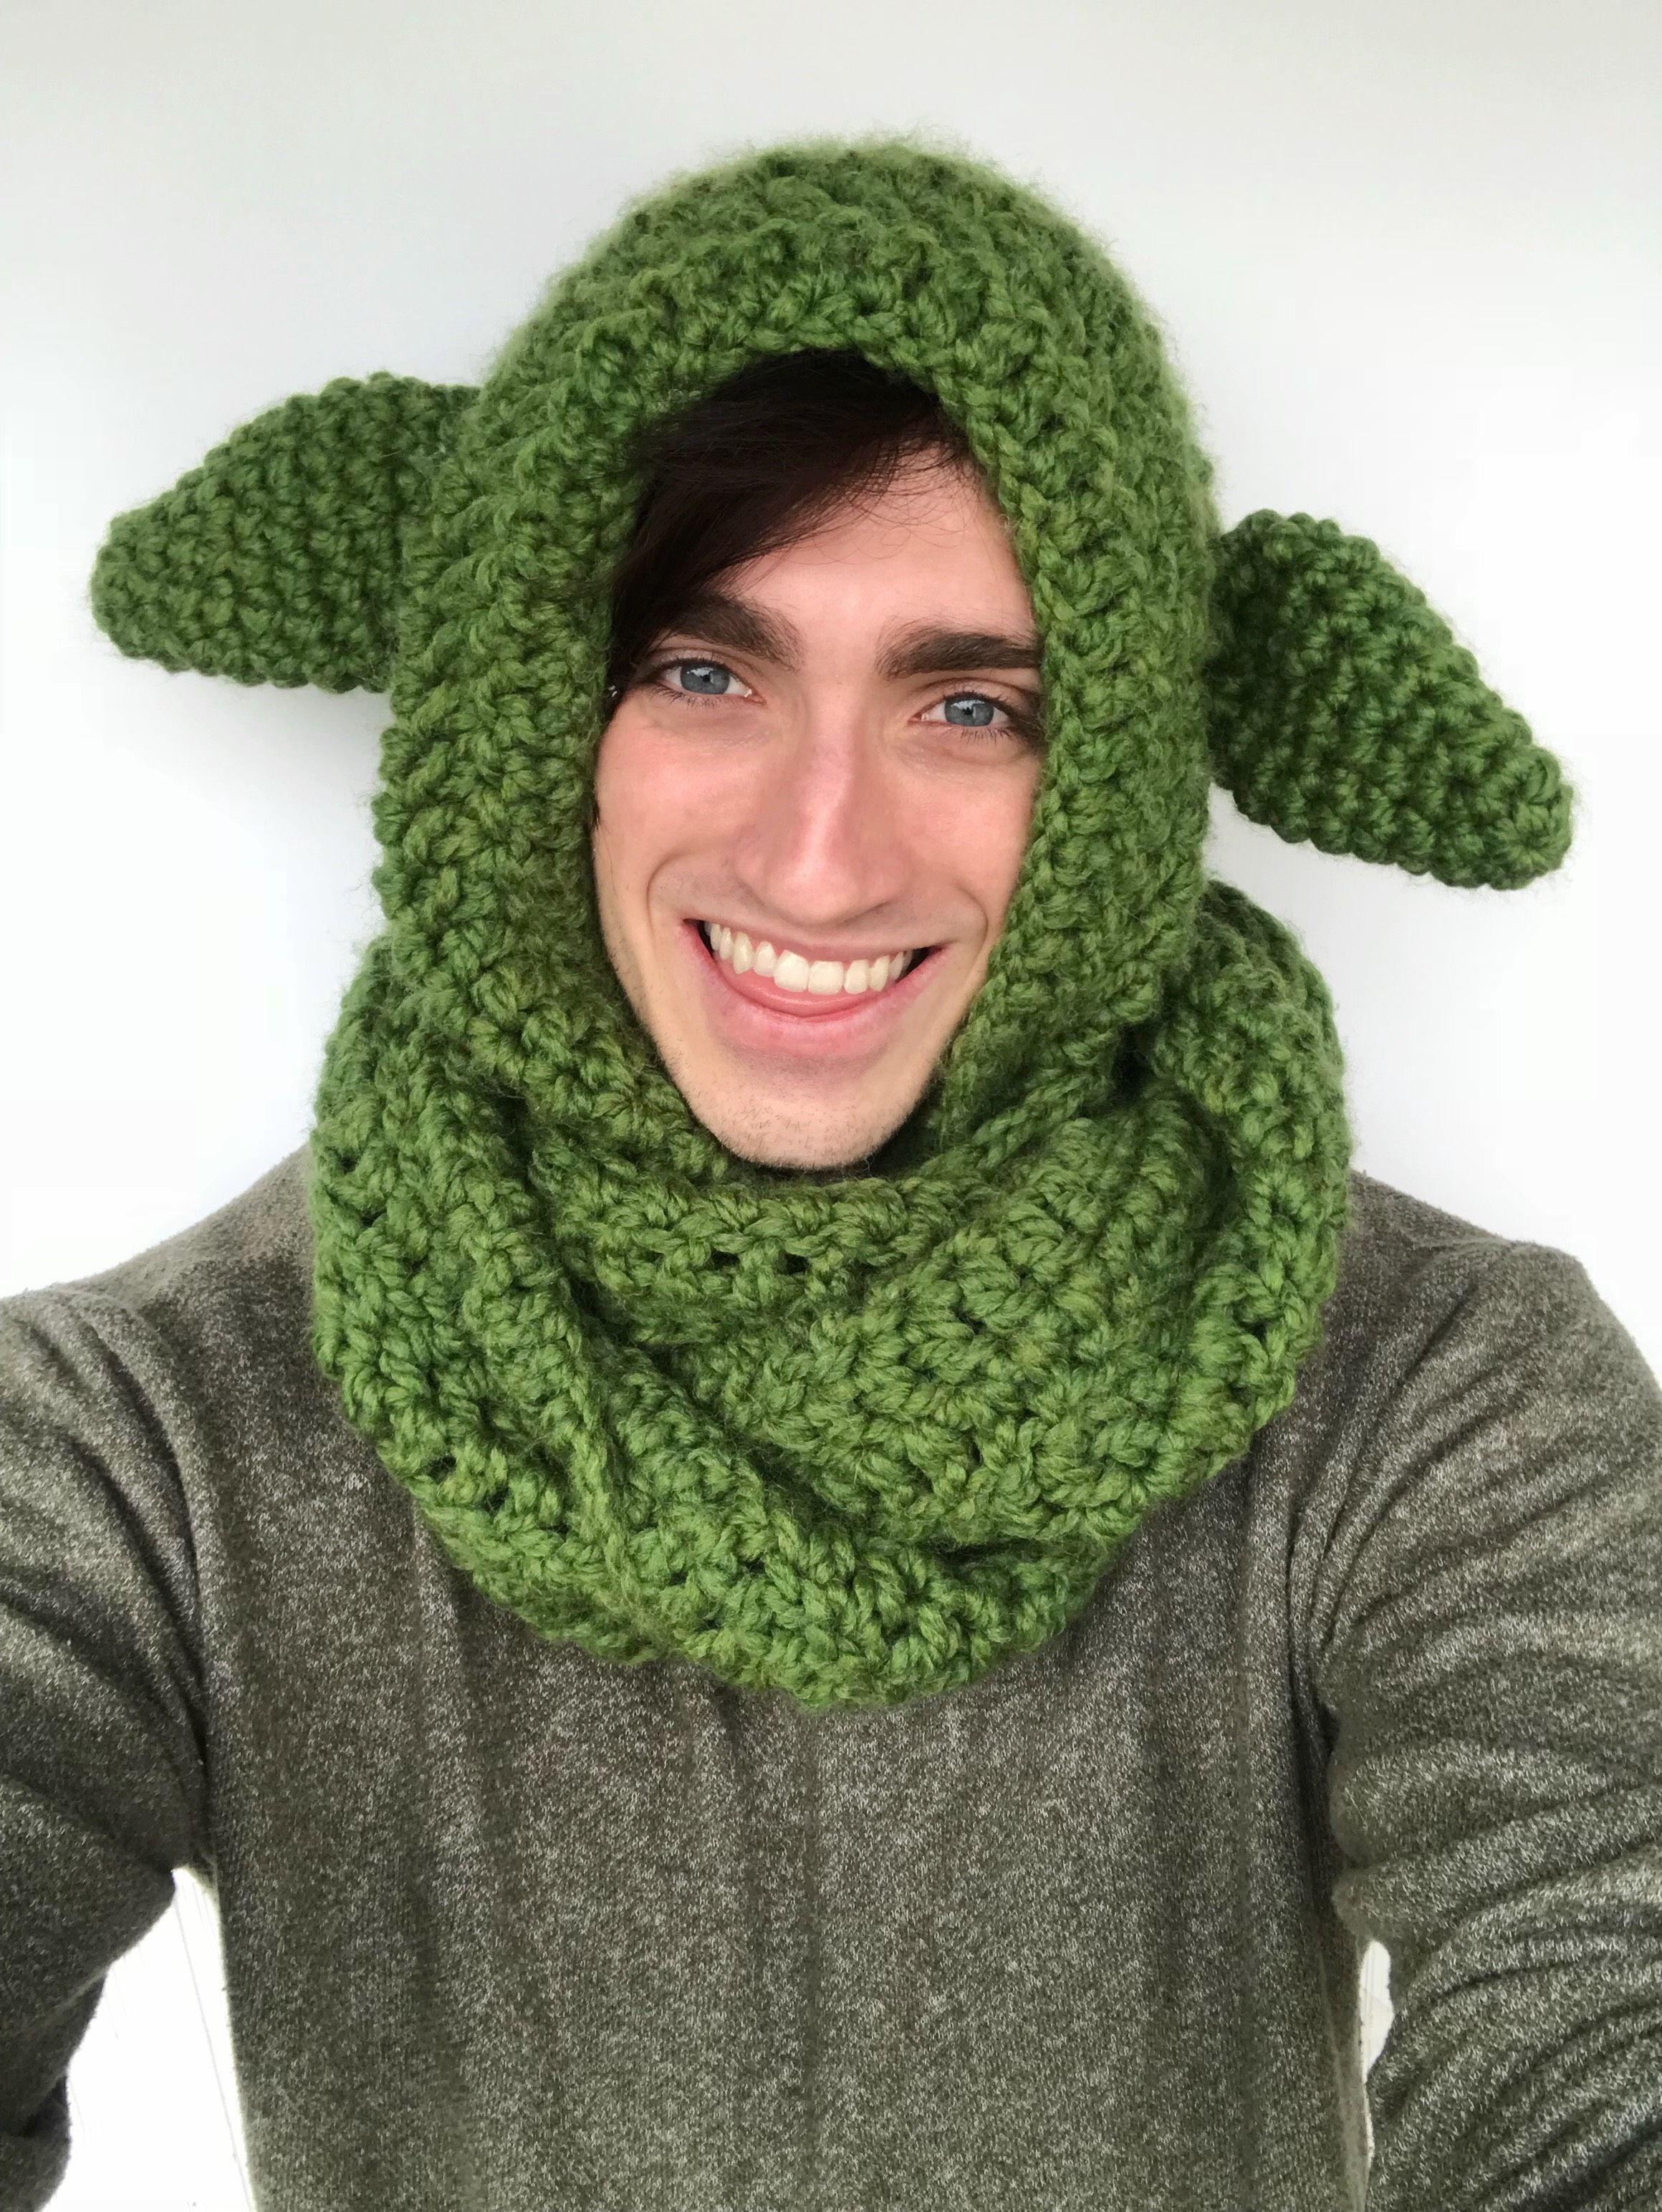 IMG_8646.JPG   crochet   Pinterest   Crochet, Free pattern and Yarns